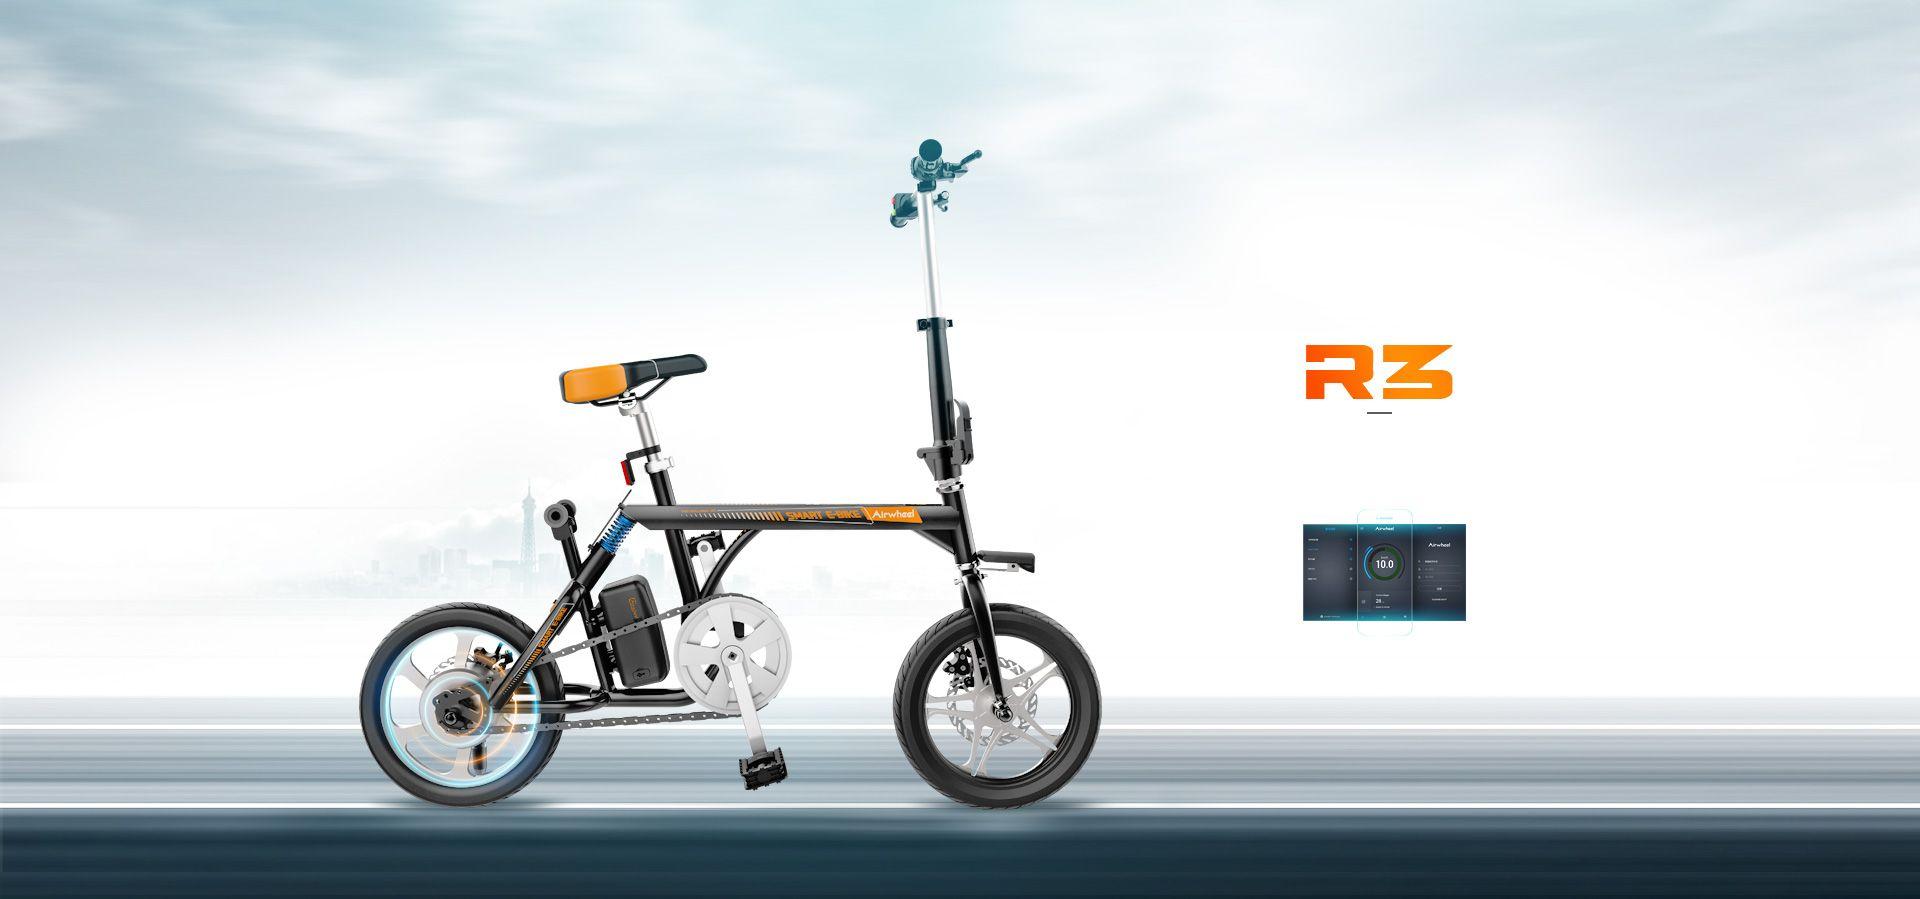 Airwheel R3 Mini Smart Electric Assist Bike The Innovator In